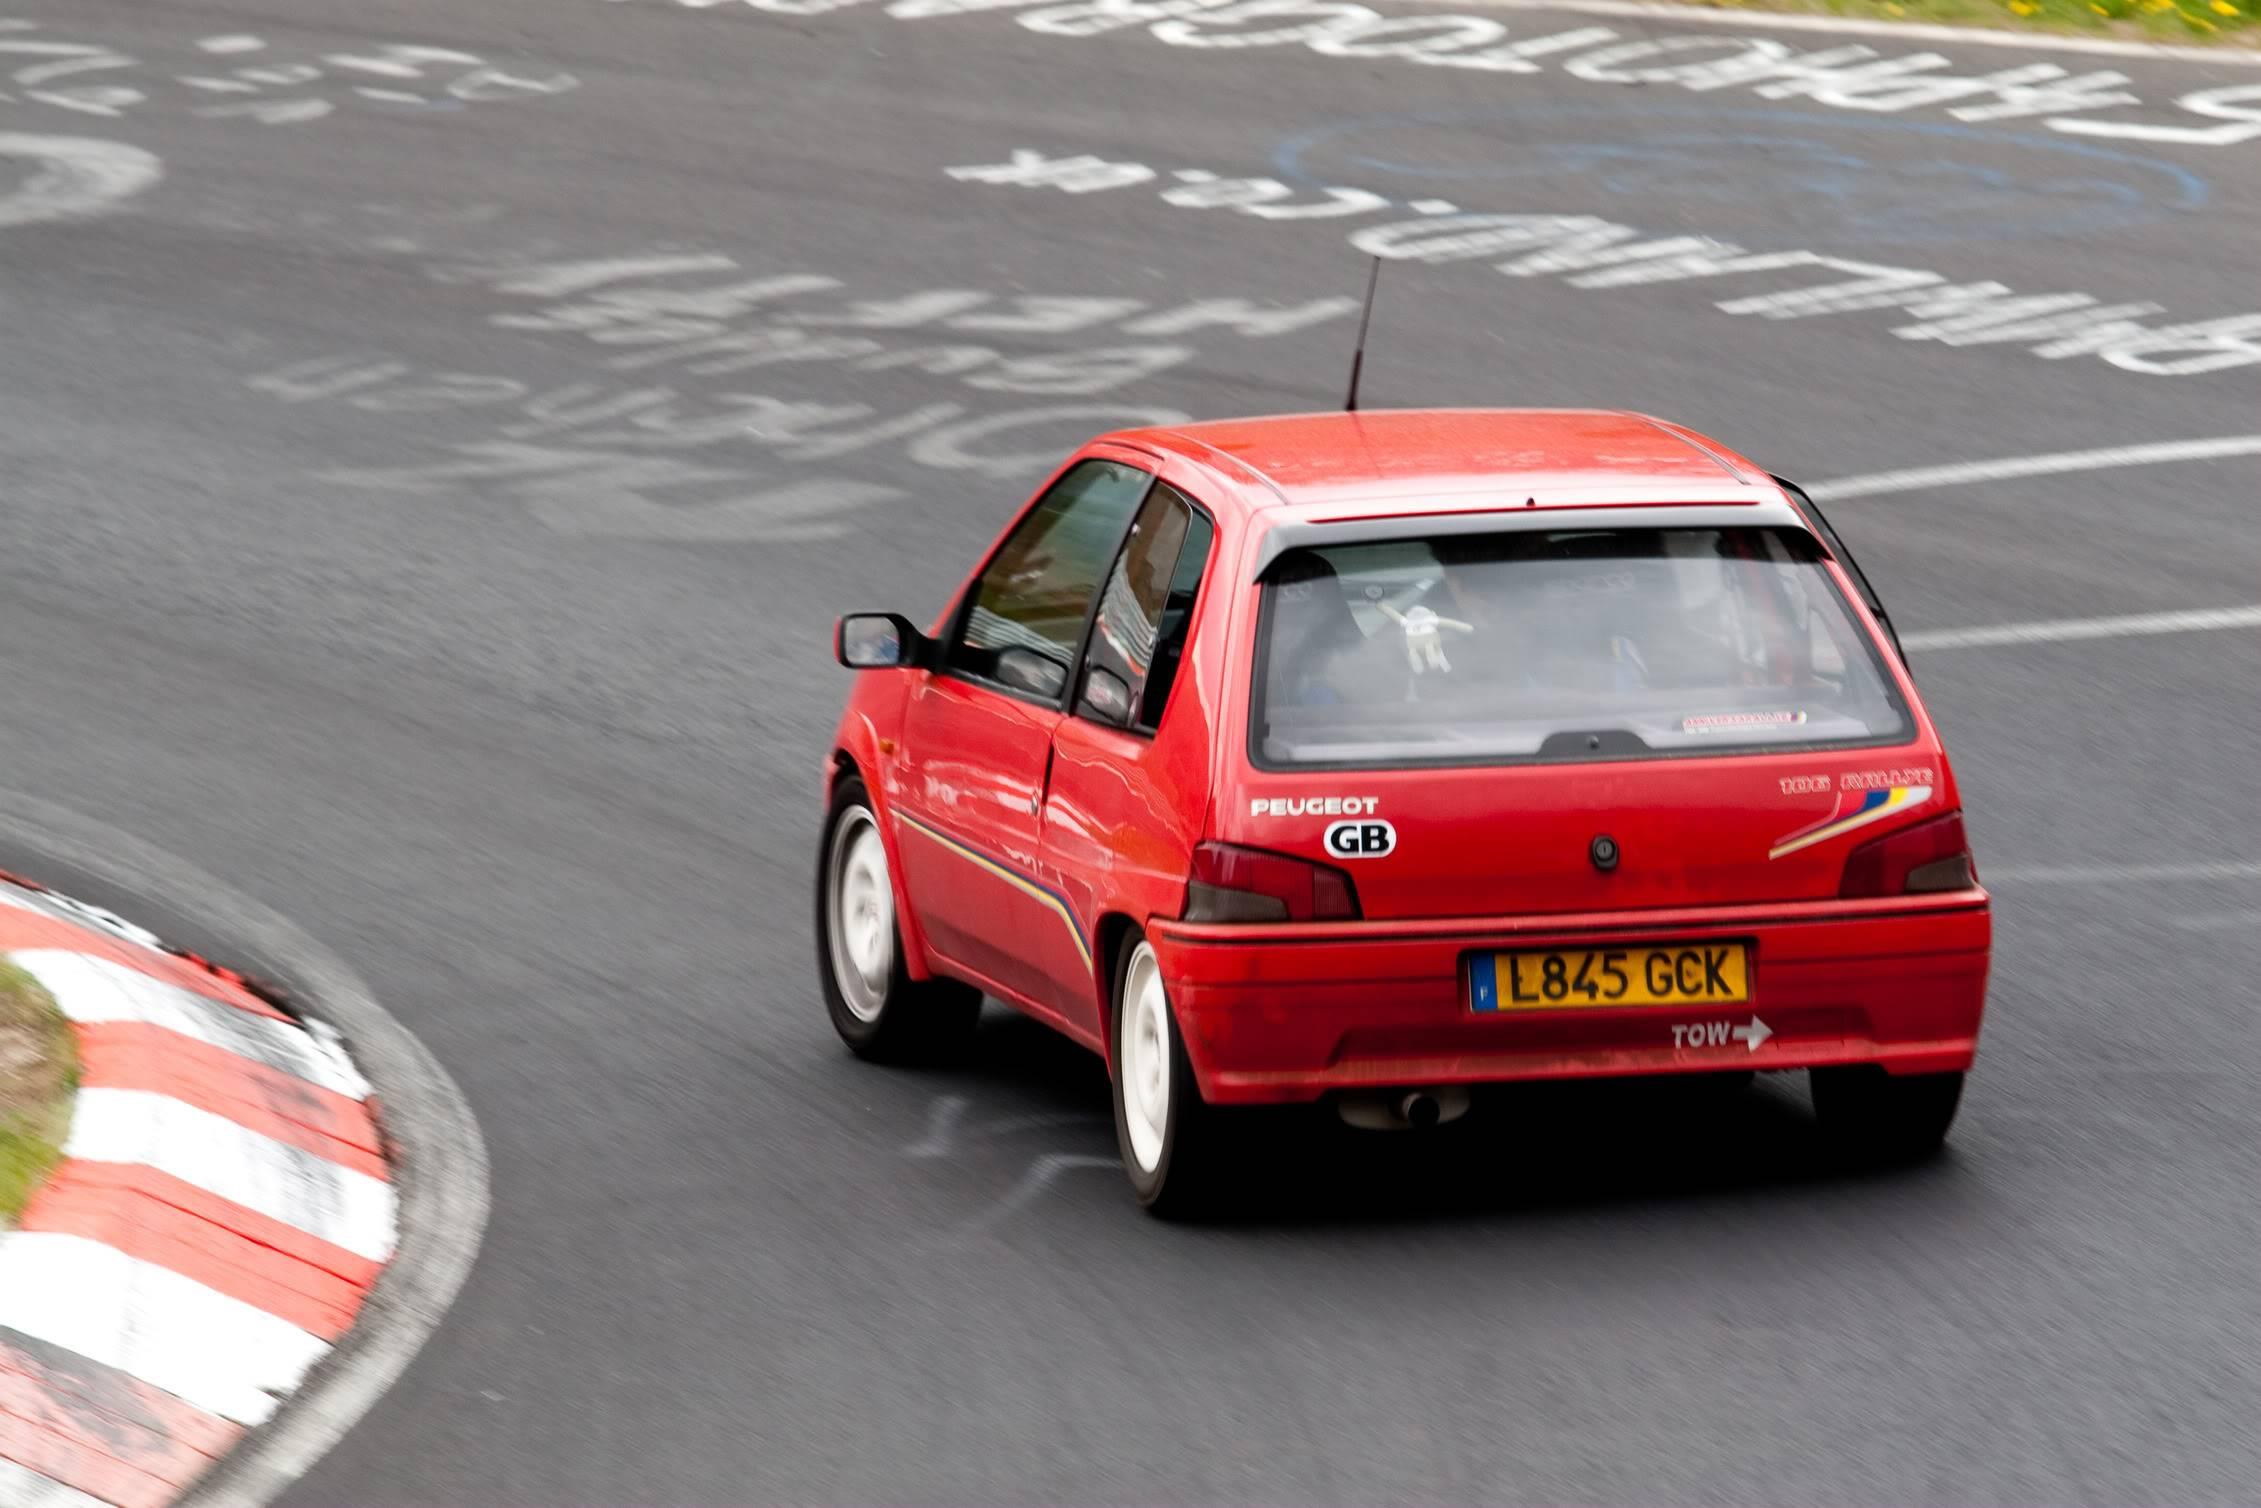 low mileage JP4'd S1 rallye (153 bhp) really nice spec! _MG_1909